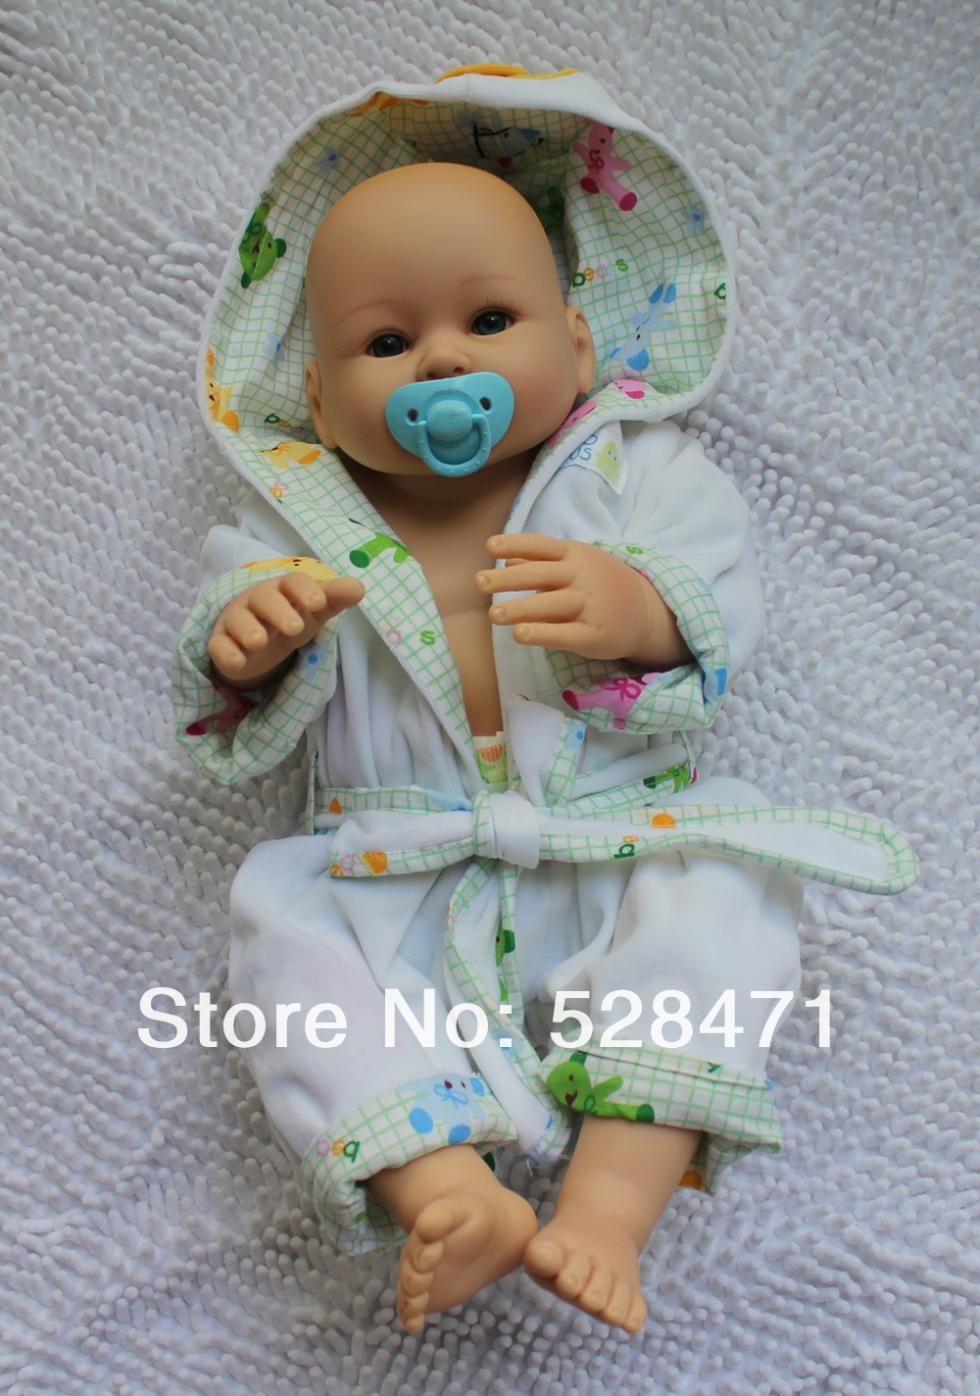 Куклы-младенцы и reborn ручной работы